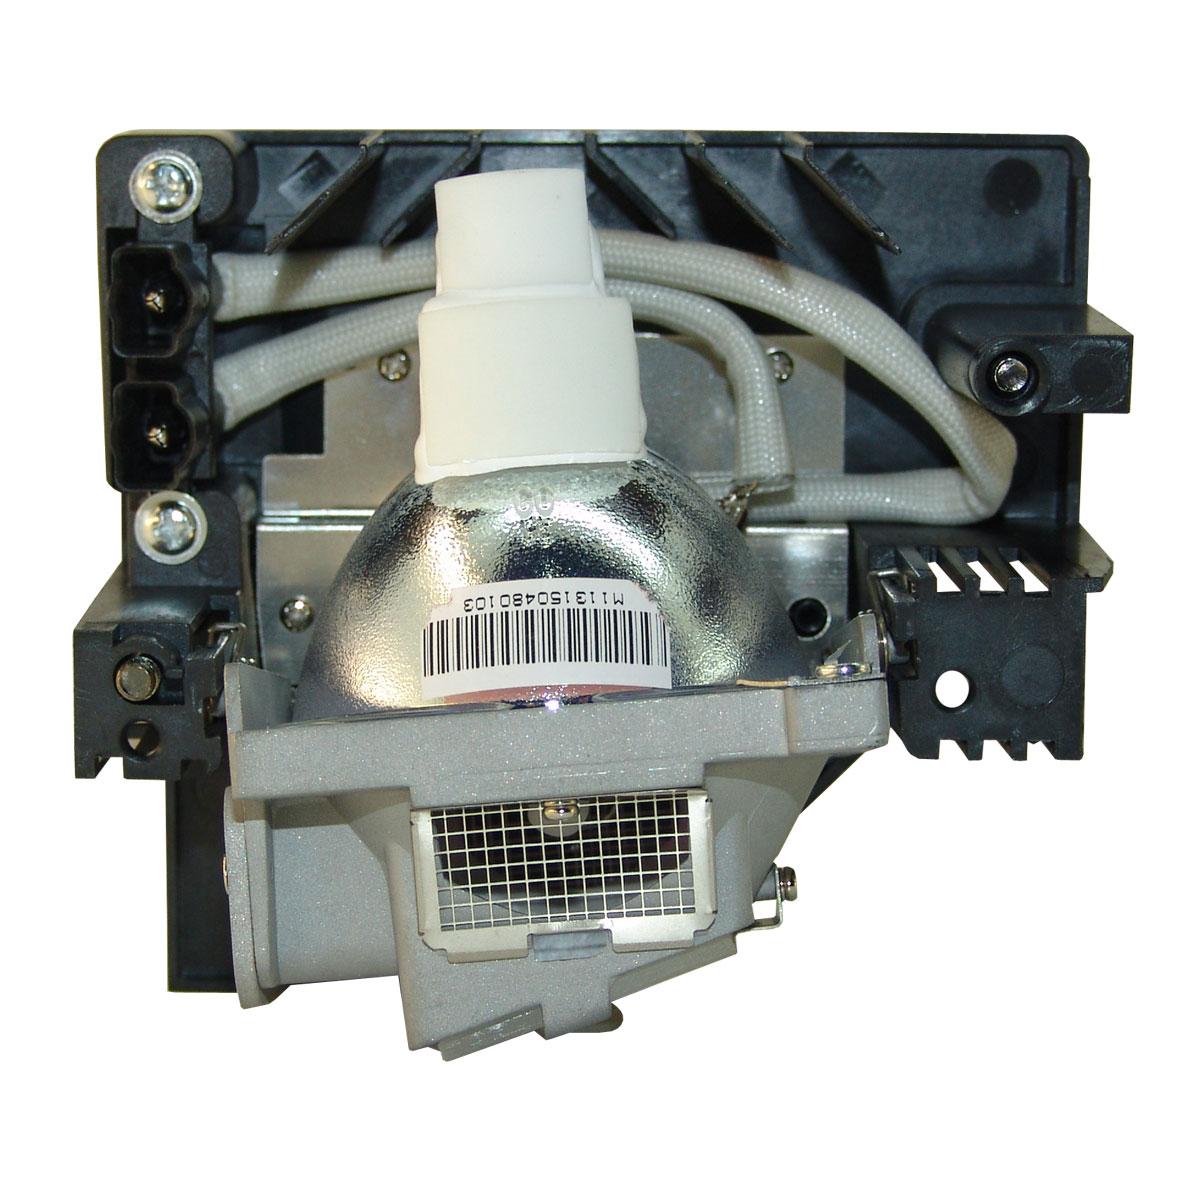 XpertMall Replacement Lamp Housing Planar PR2010 Assembly Osram P-VIP Bulb Inside